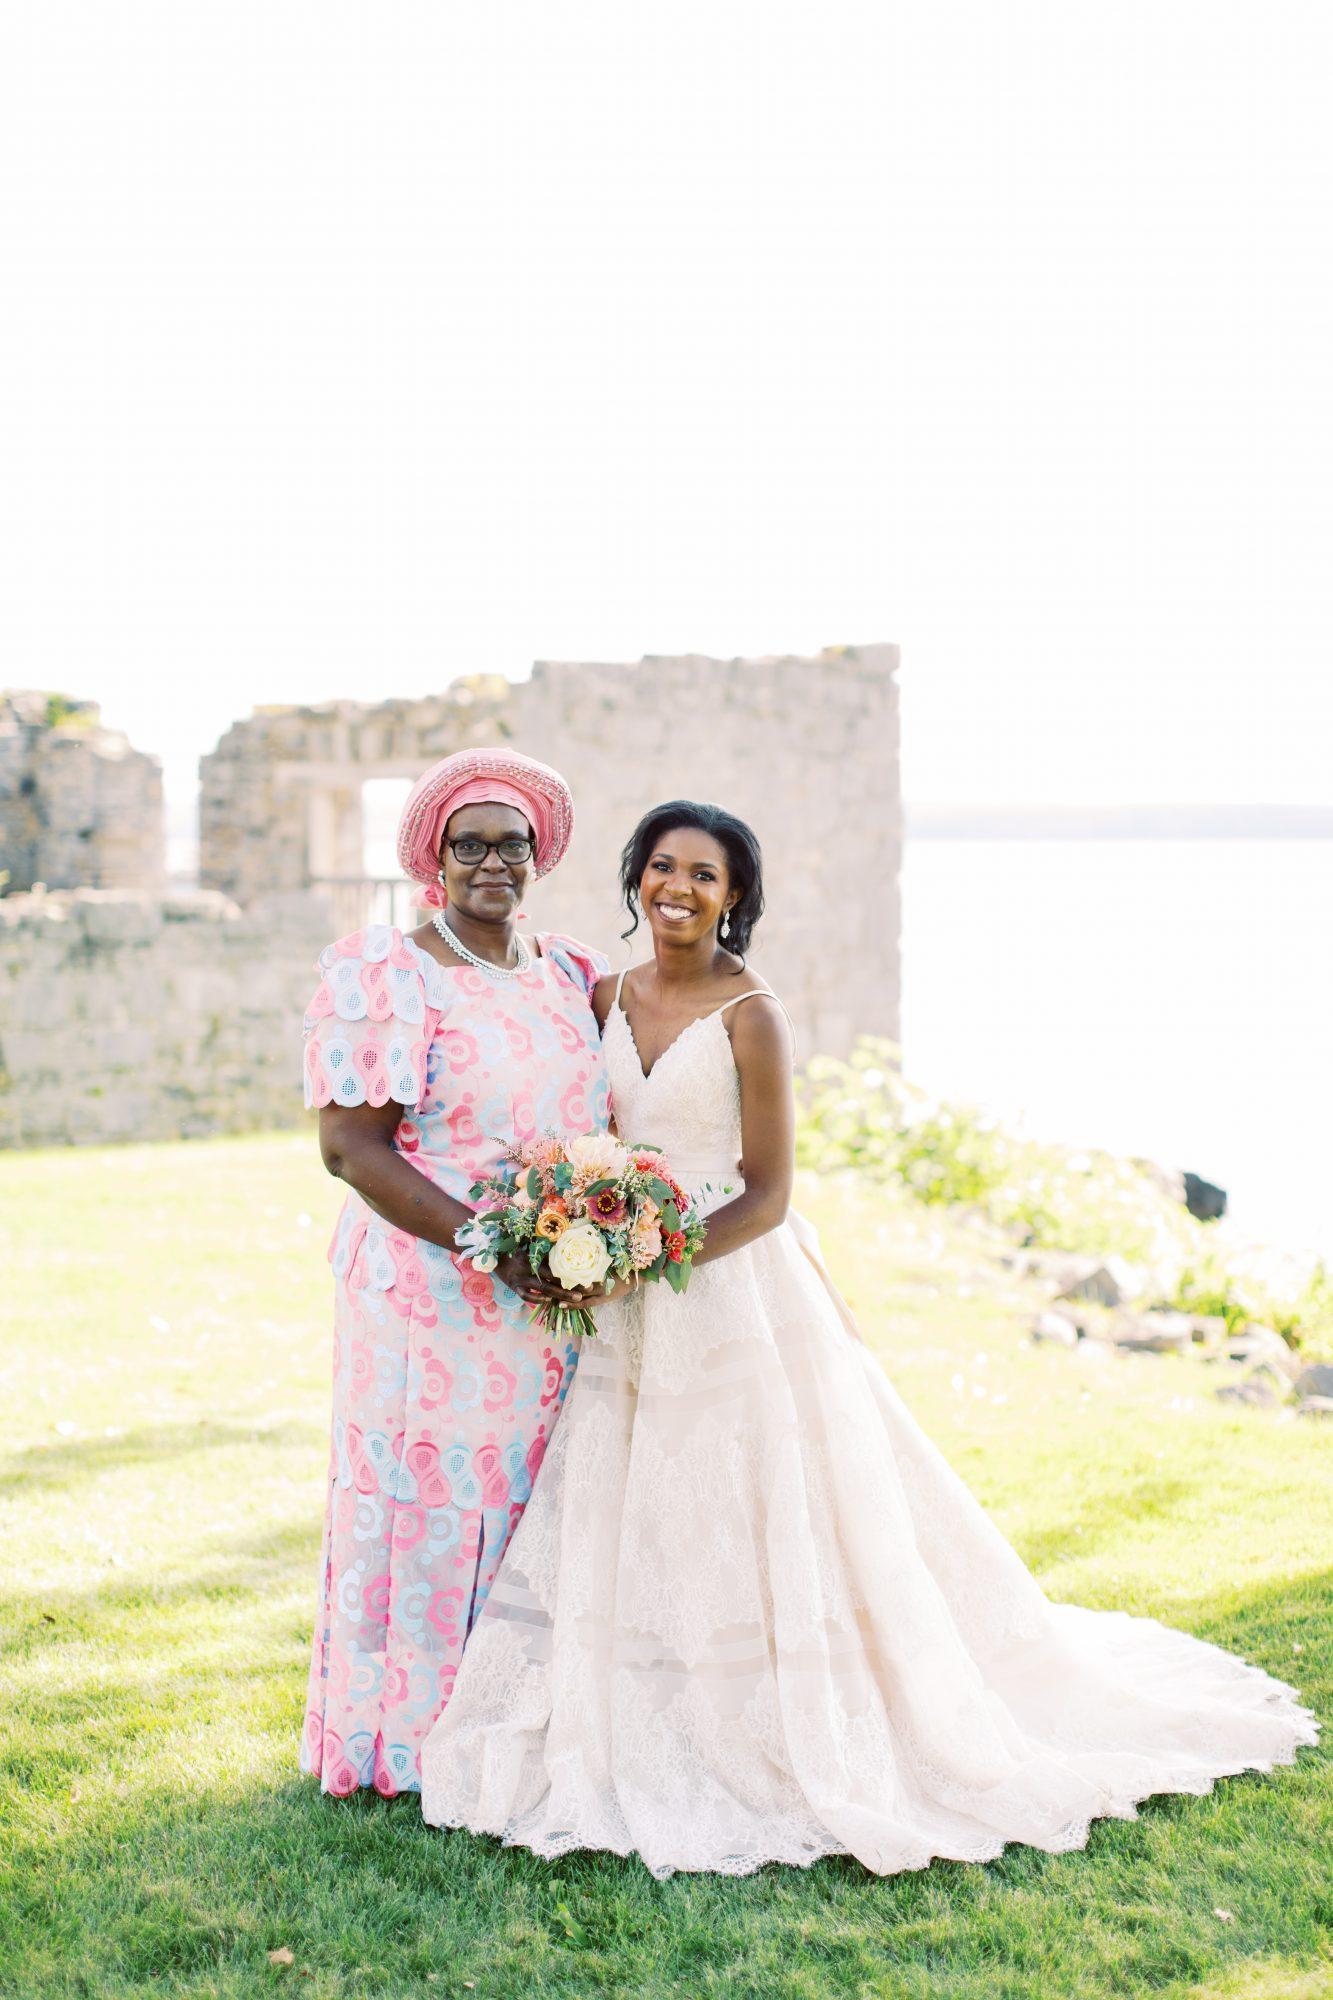 charlene jeremy wedding bride posing with mom